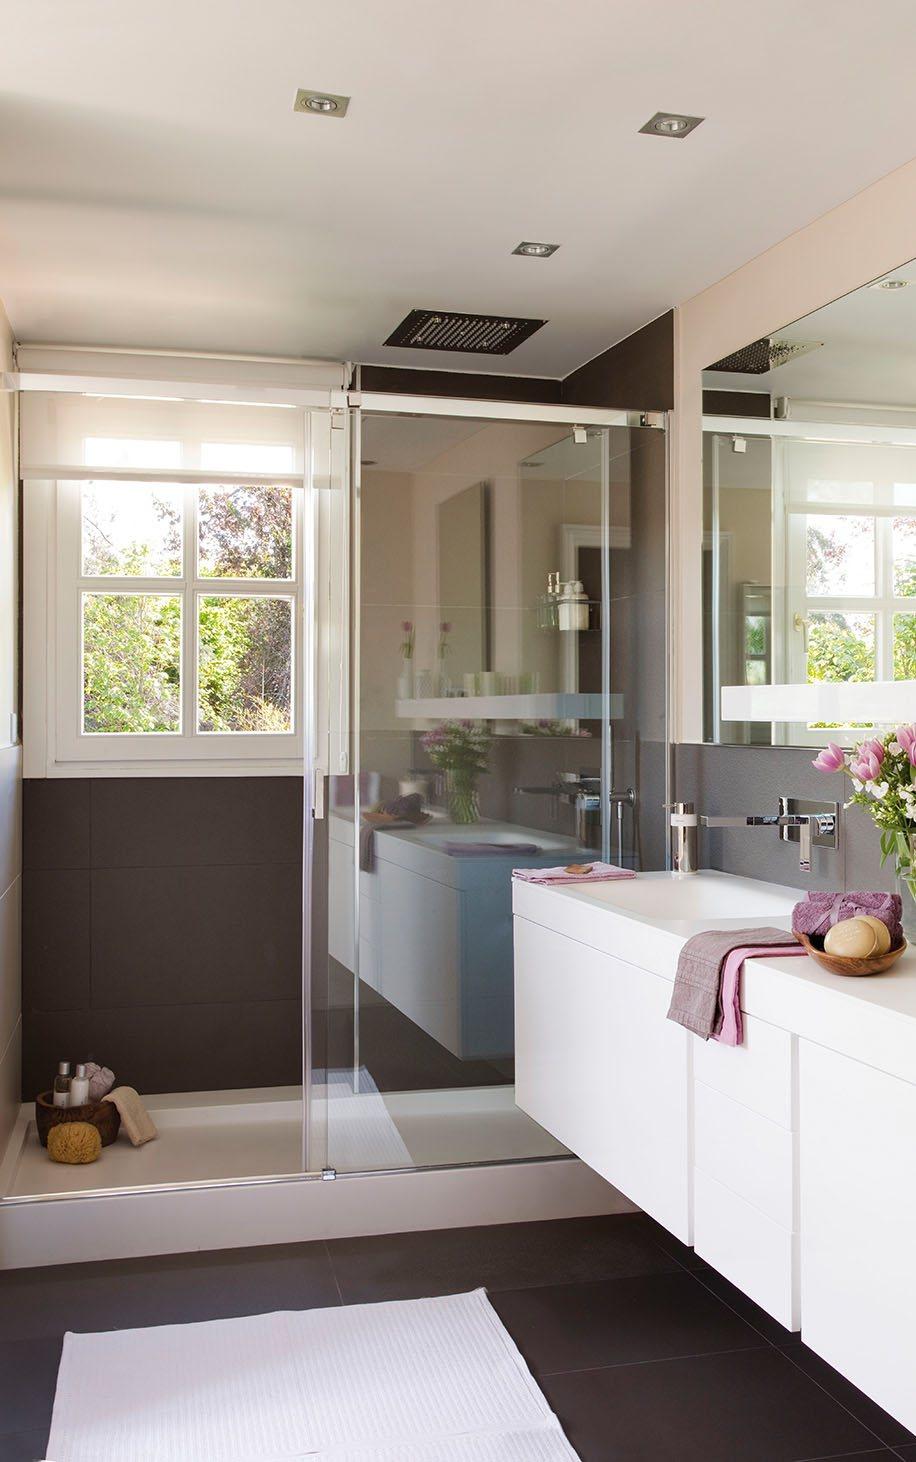 ideas para ba os peque os. Black Bedroom Furniture Sets. Home Design Ideas